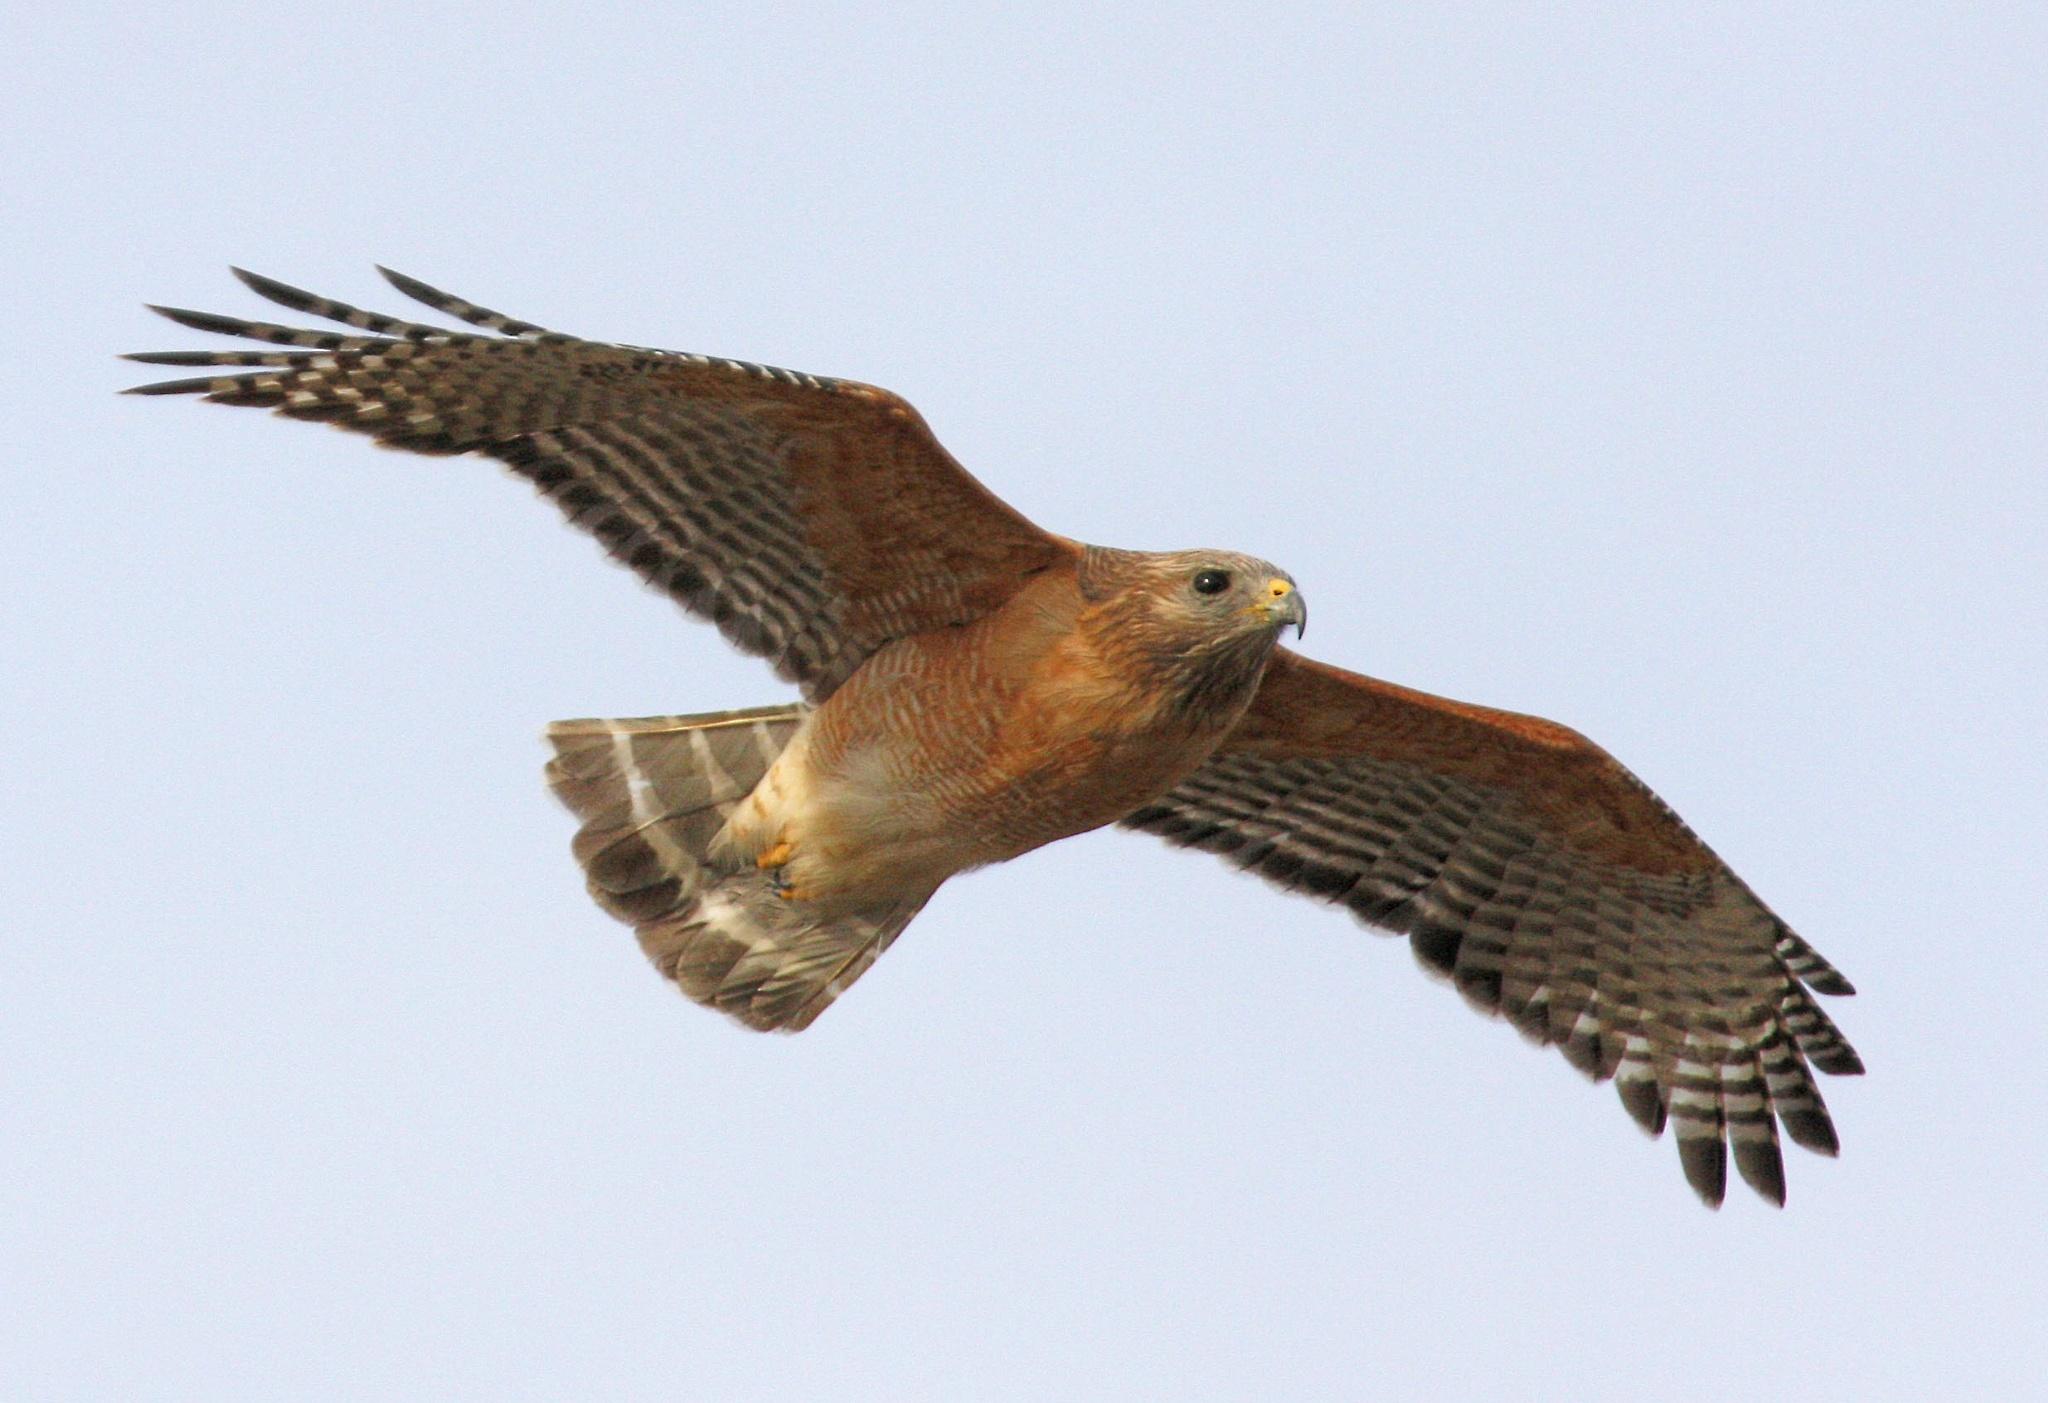 Red Shouldered Hawk in Flight by JepThor